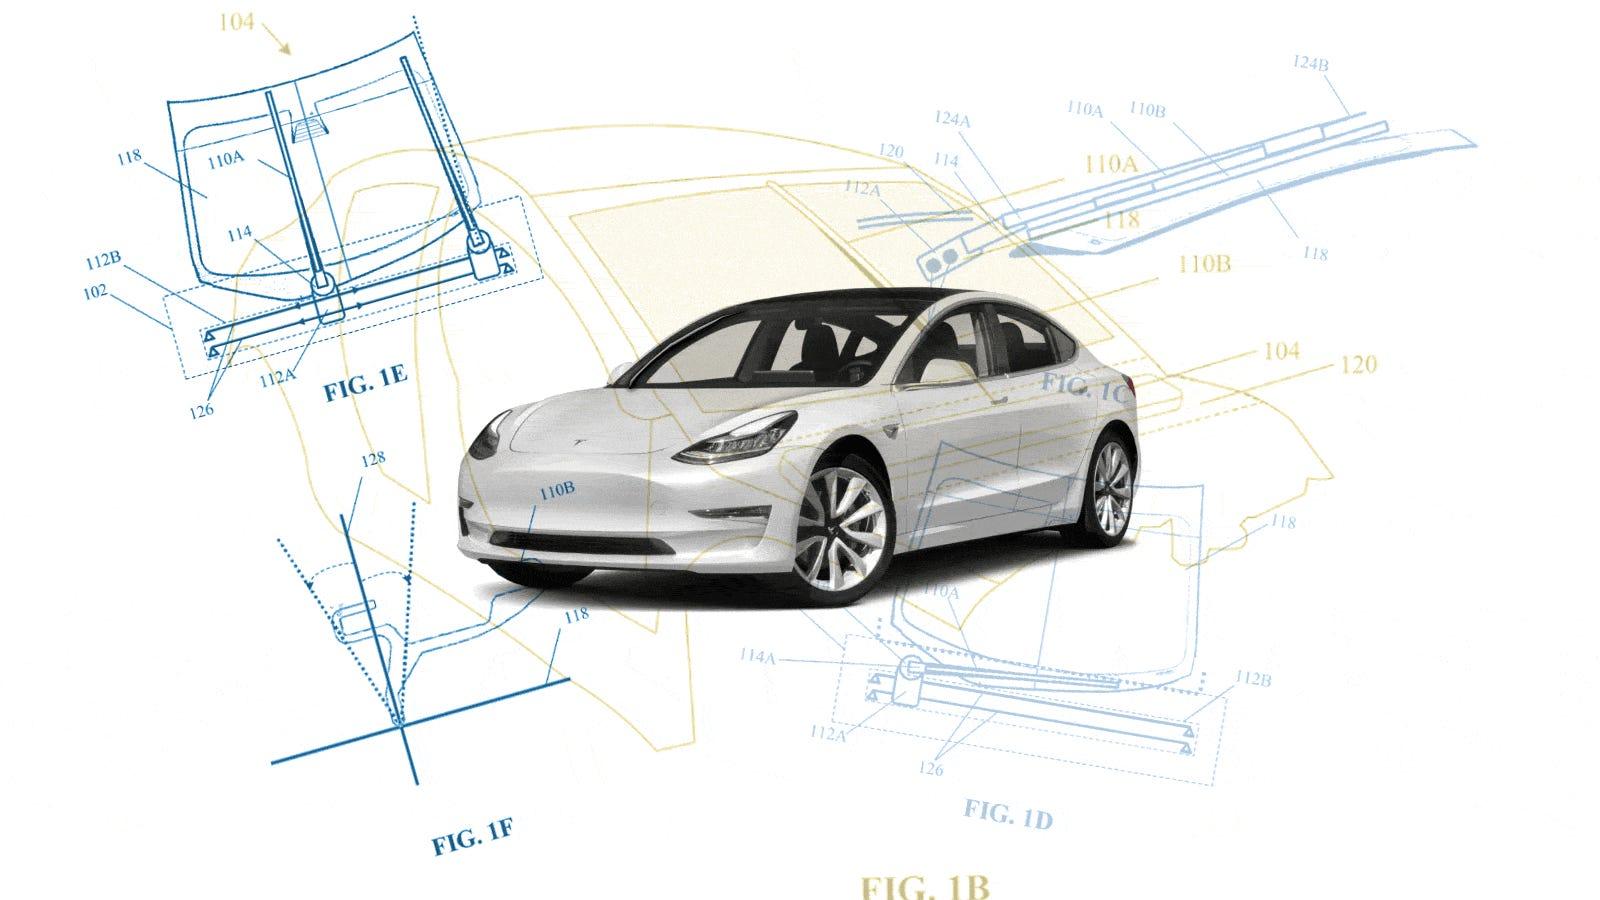 Telsa's 'Electromagnetic Windshield Wiper' Patent Looks Pretty Cool For A Windshield Wiper